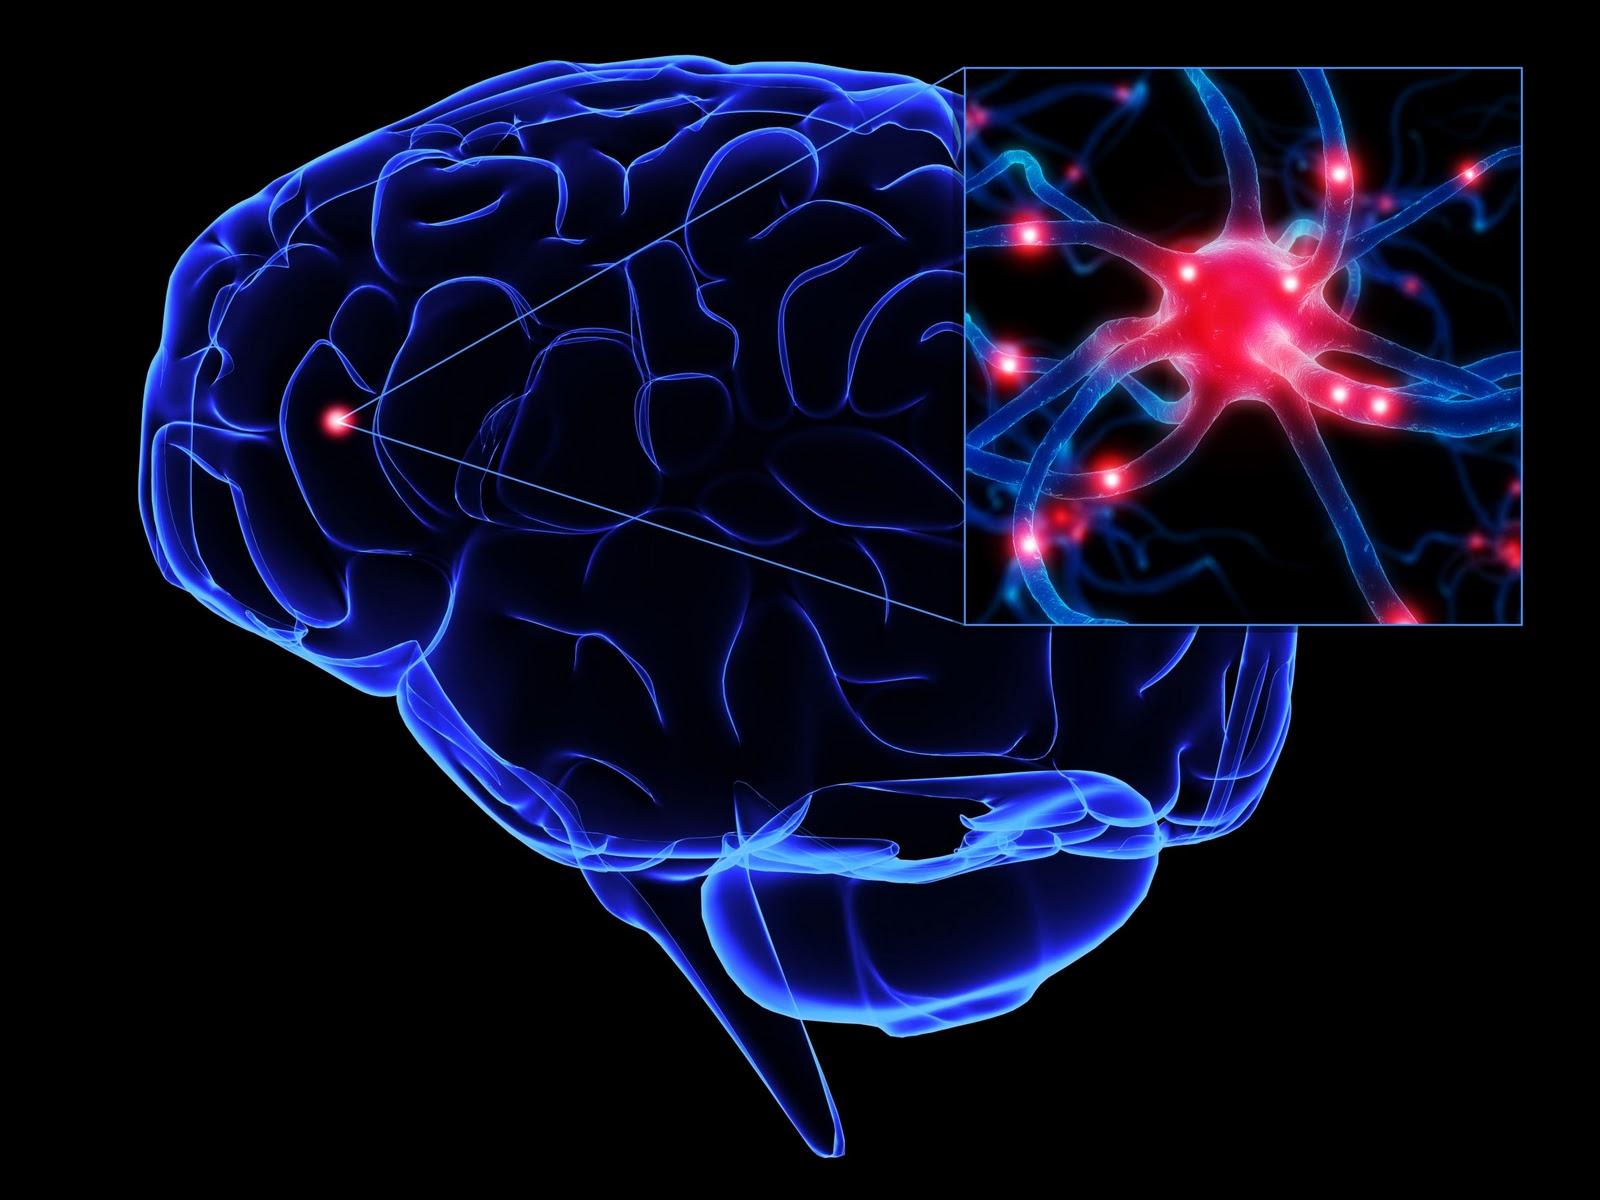 http://neurofis.com.br/img_noticias/1430239032.8-foto-0.jpeg